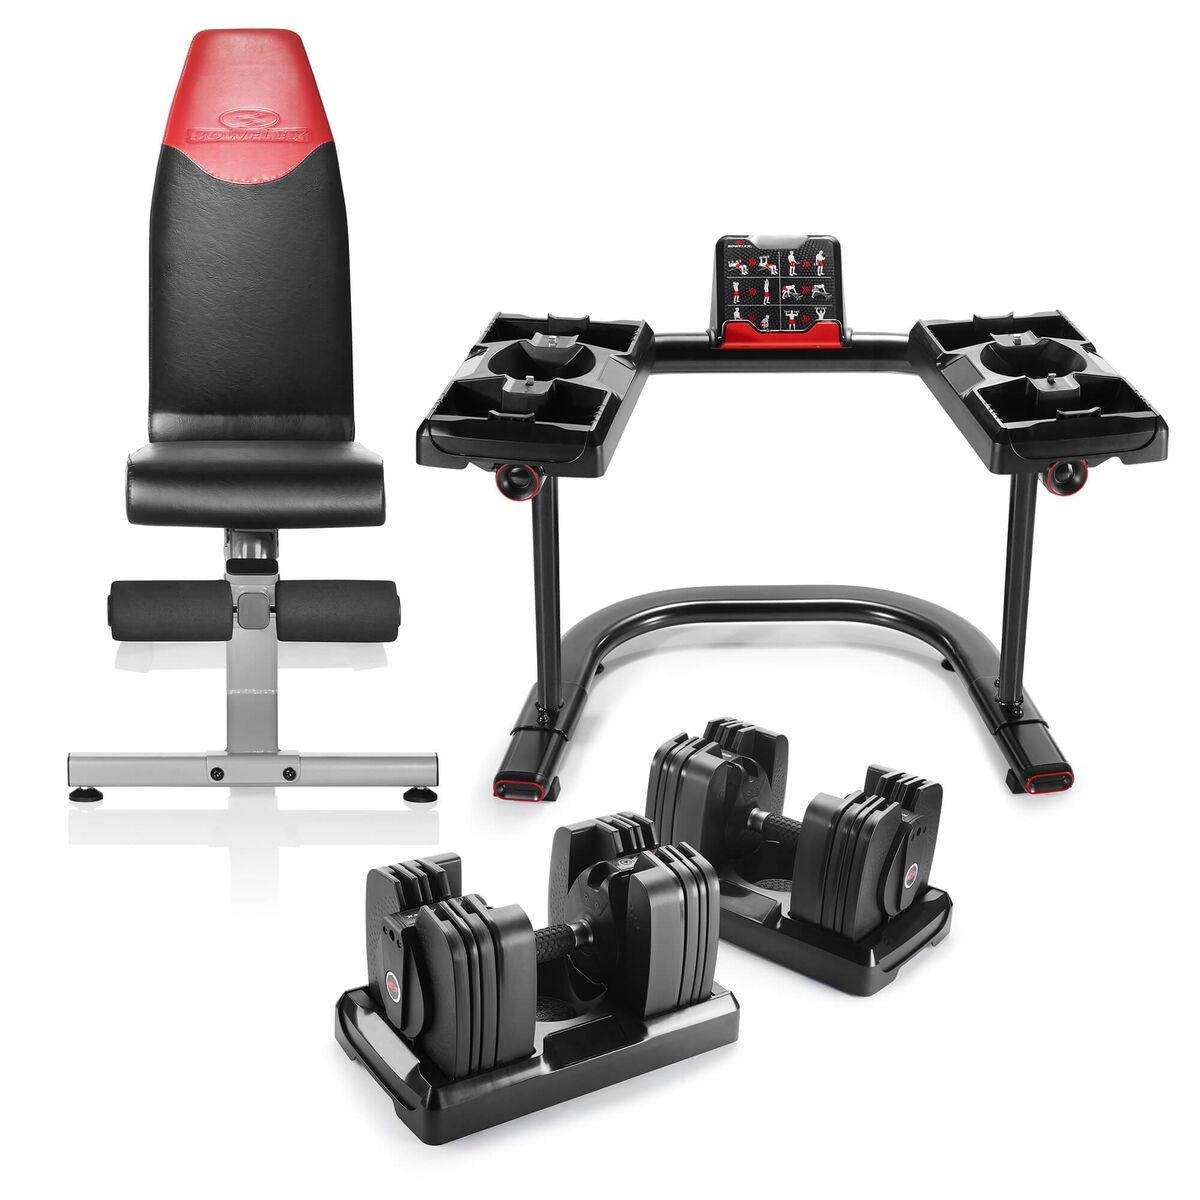 Bowflex Adjustable Dumbbells Exercises: Bowflex SelectTech 560, Bench, And Stand Bundle